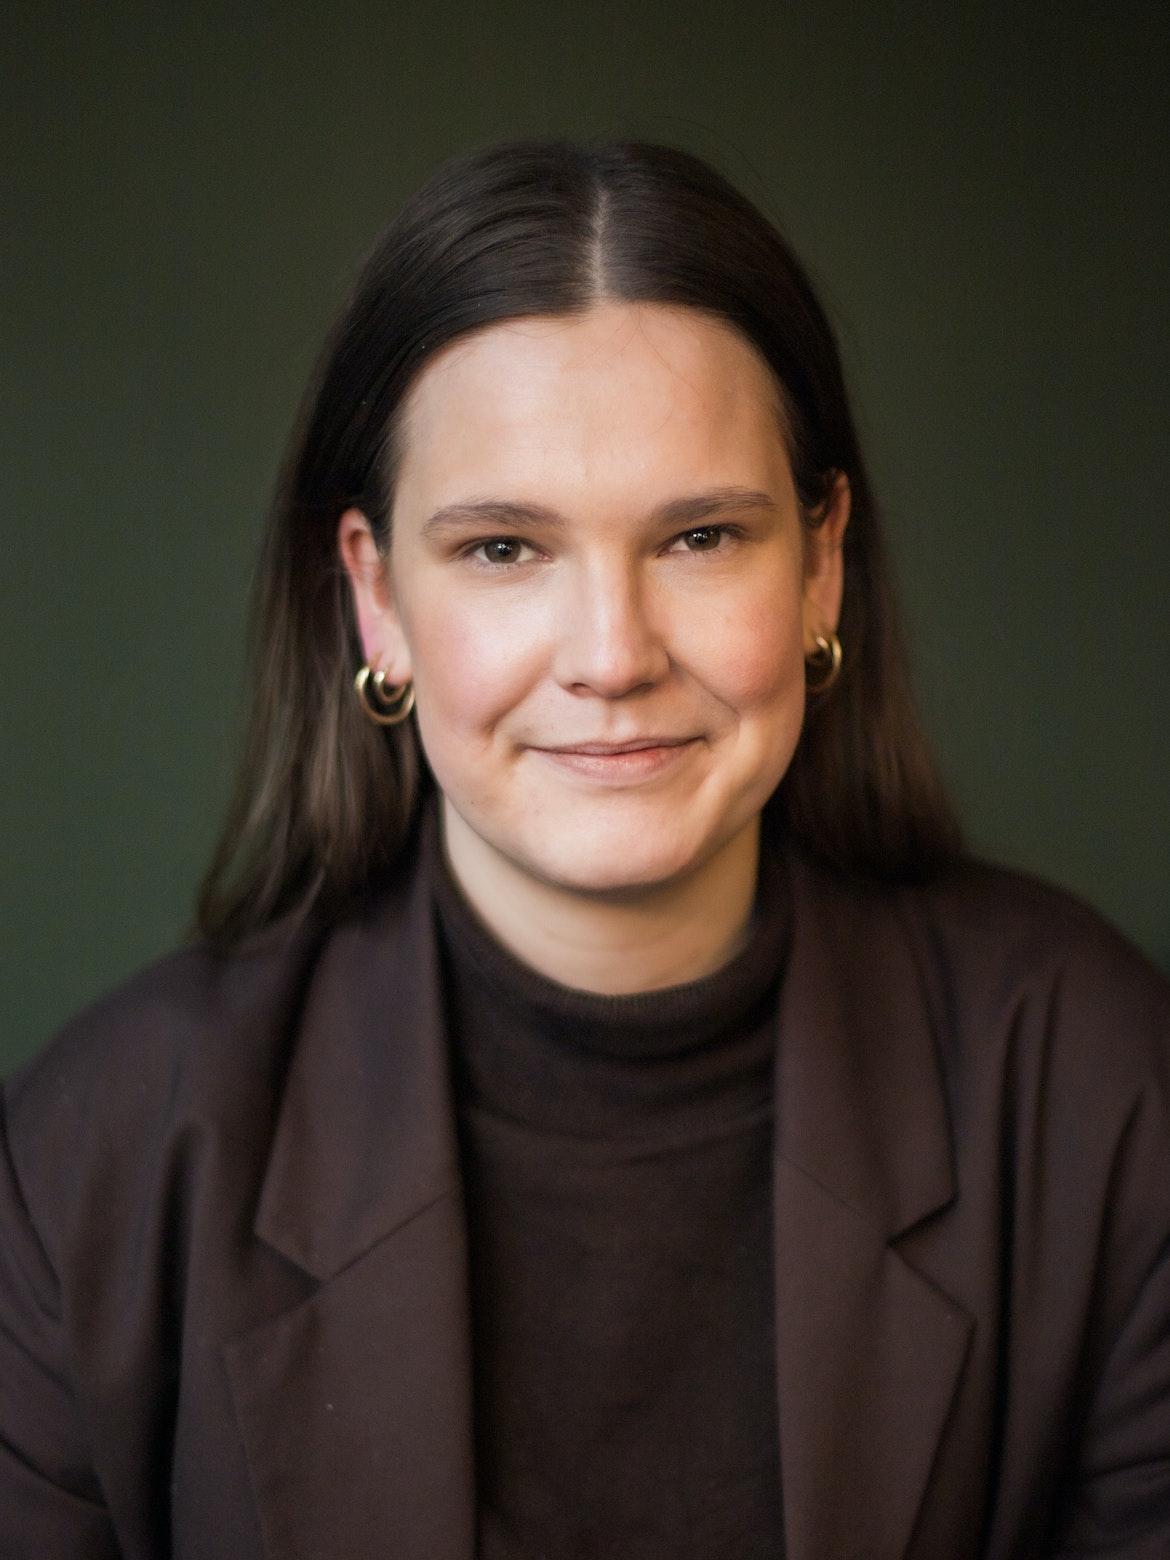 Thea Ørneseidet 1 1